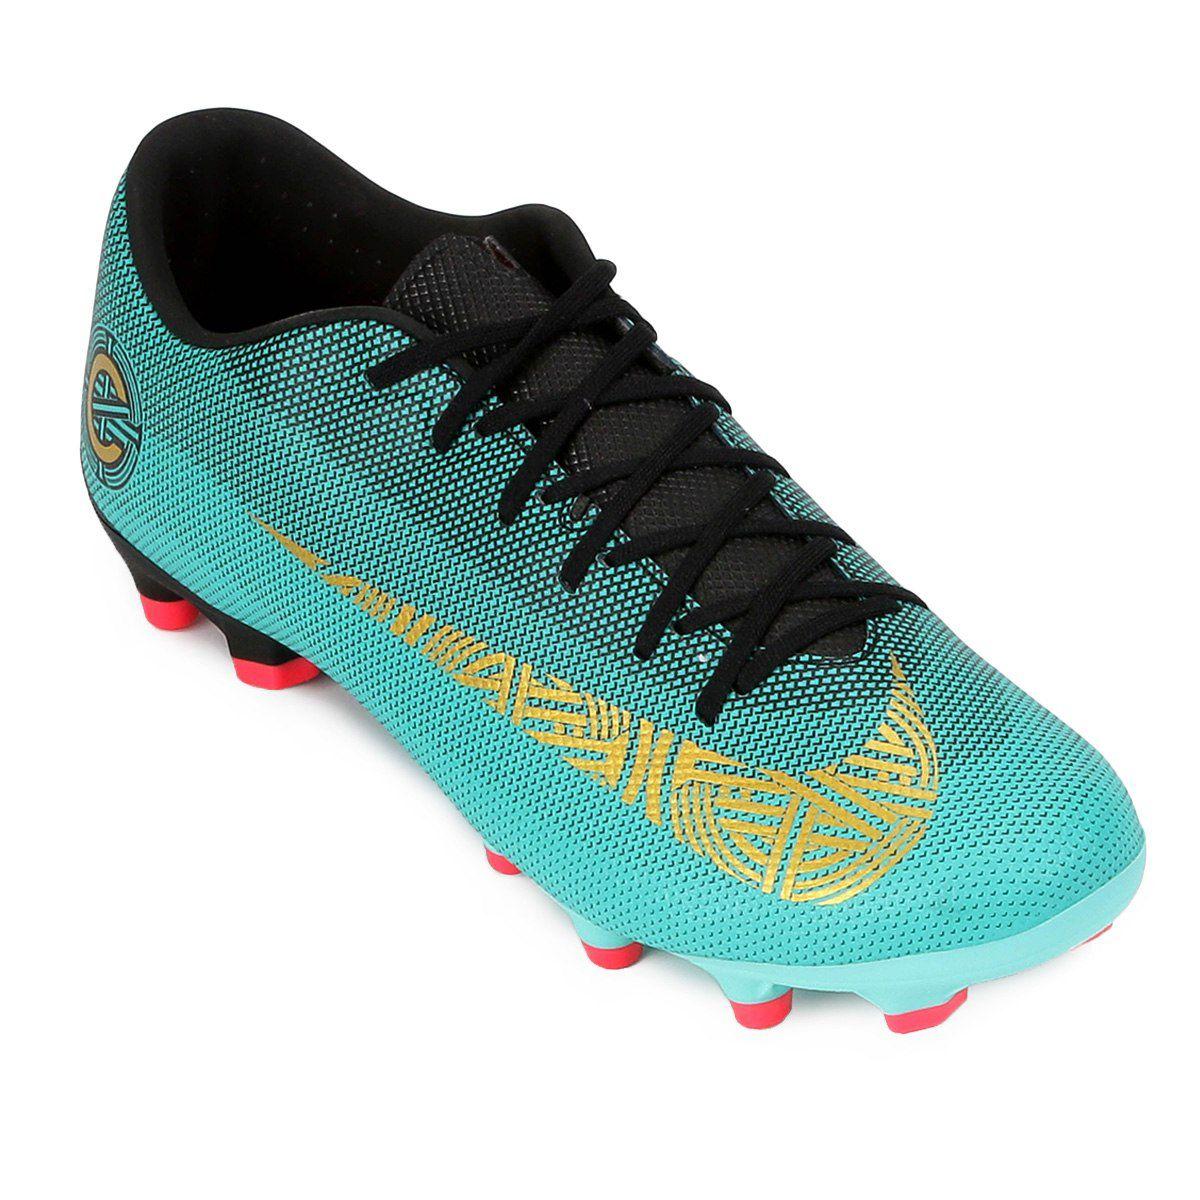 Chuteira Campo Nike Mercurial Vapor 12 Academy Cr7 Mg - BRACIA SHOP ... f2fc7fb3b8c9c